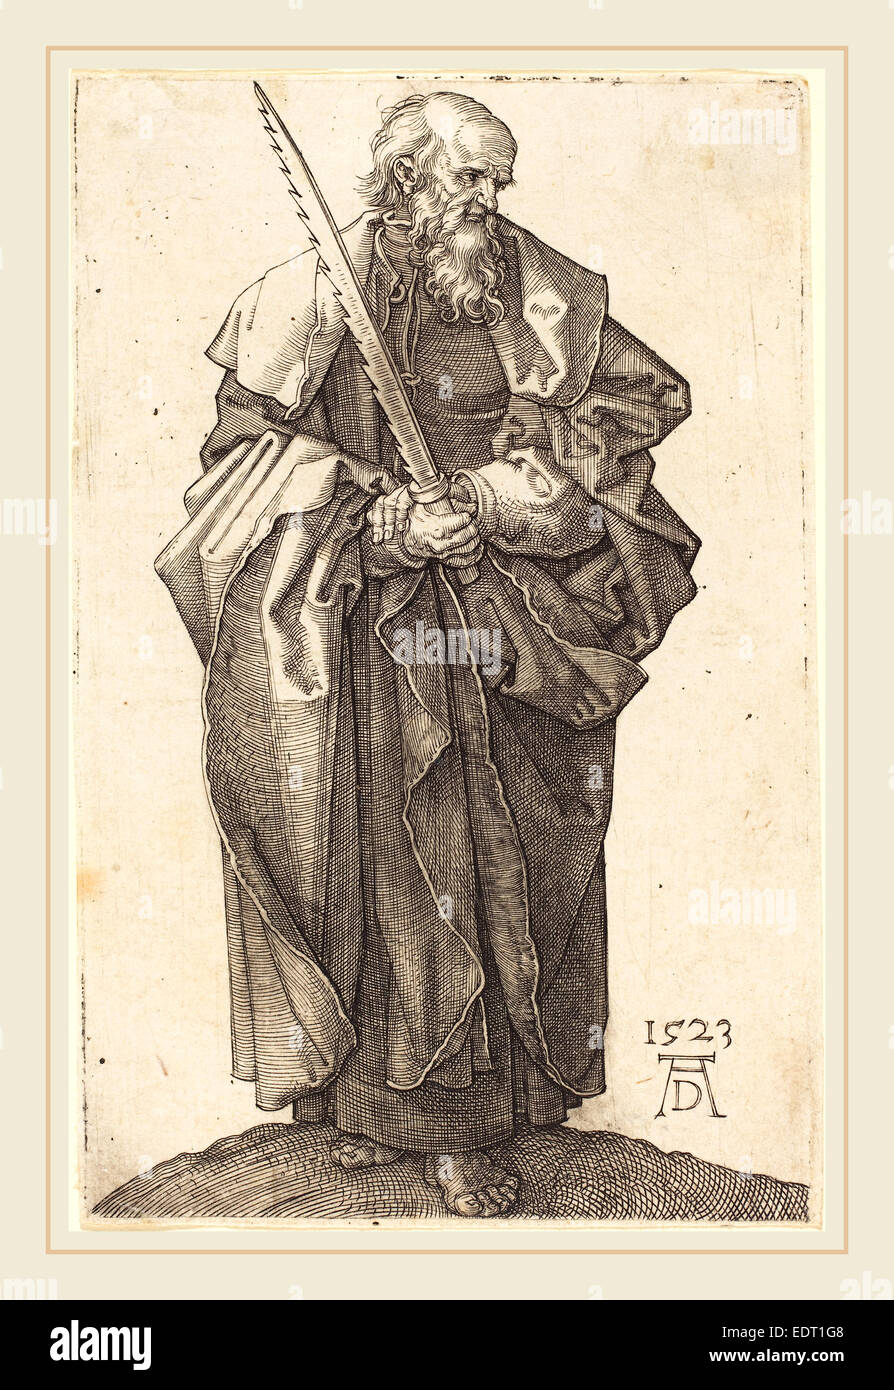 Albrecht Dürer (German, 1471-1528), Saint Simon, 1523, engraving - Stock Image